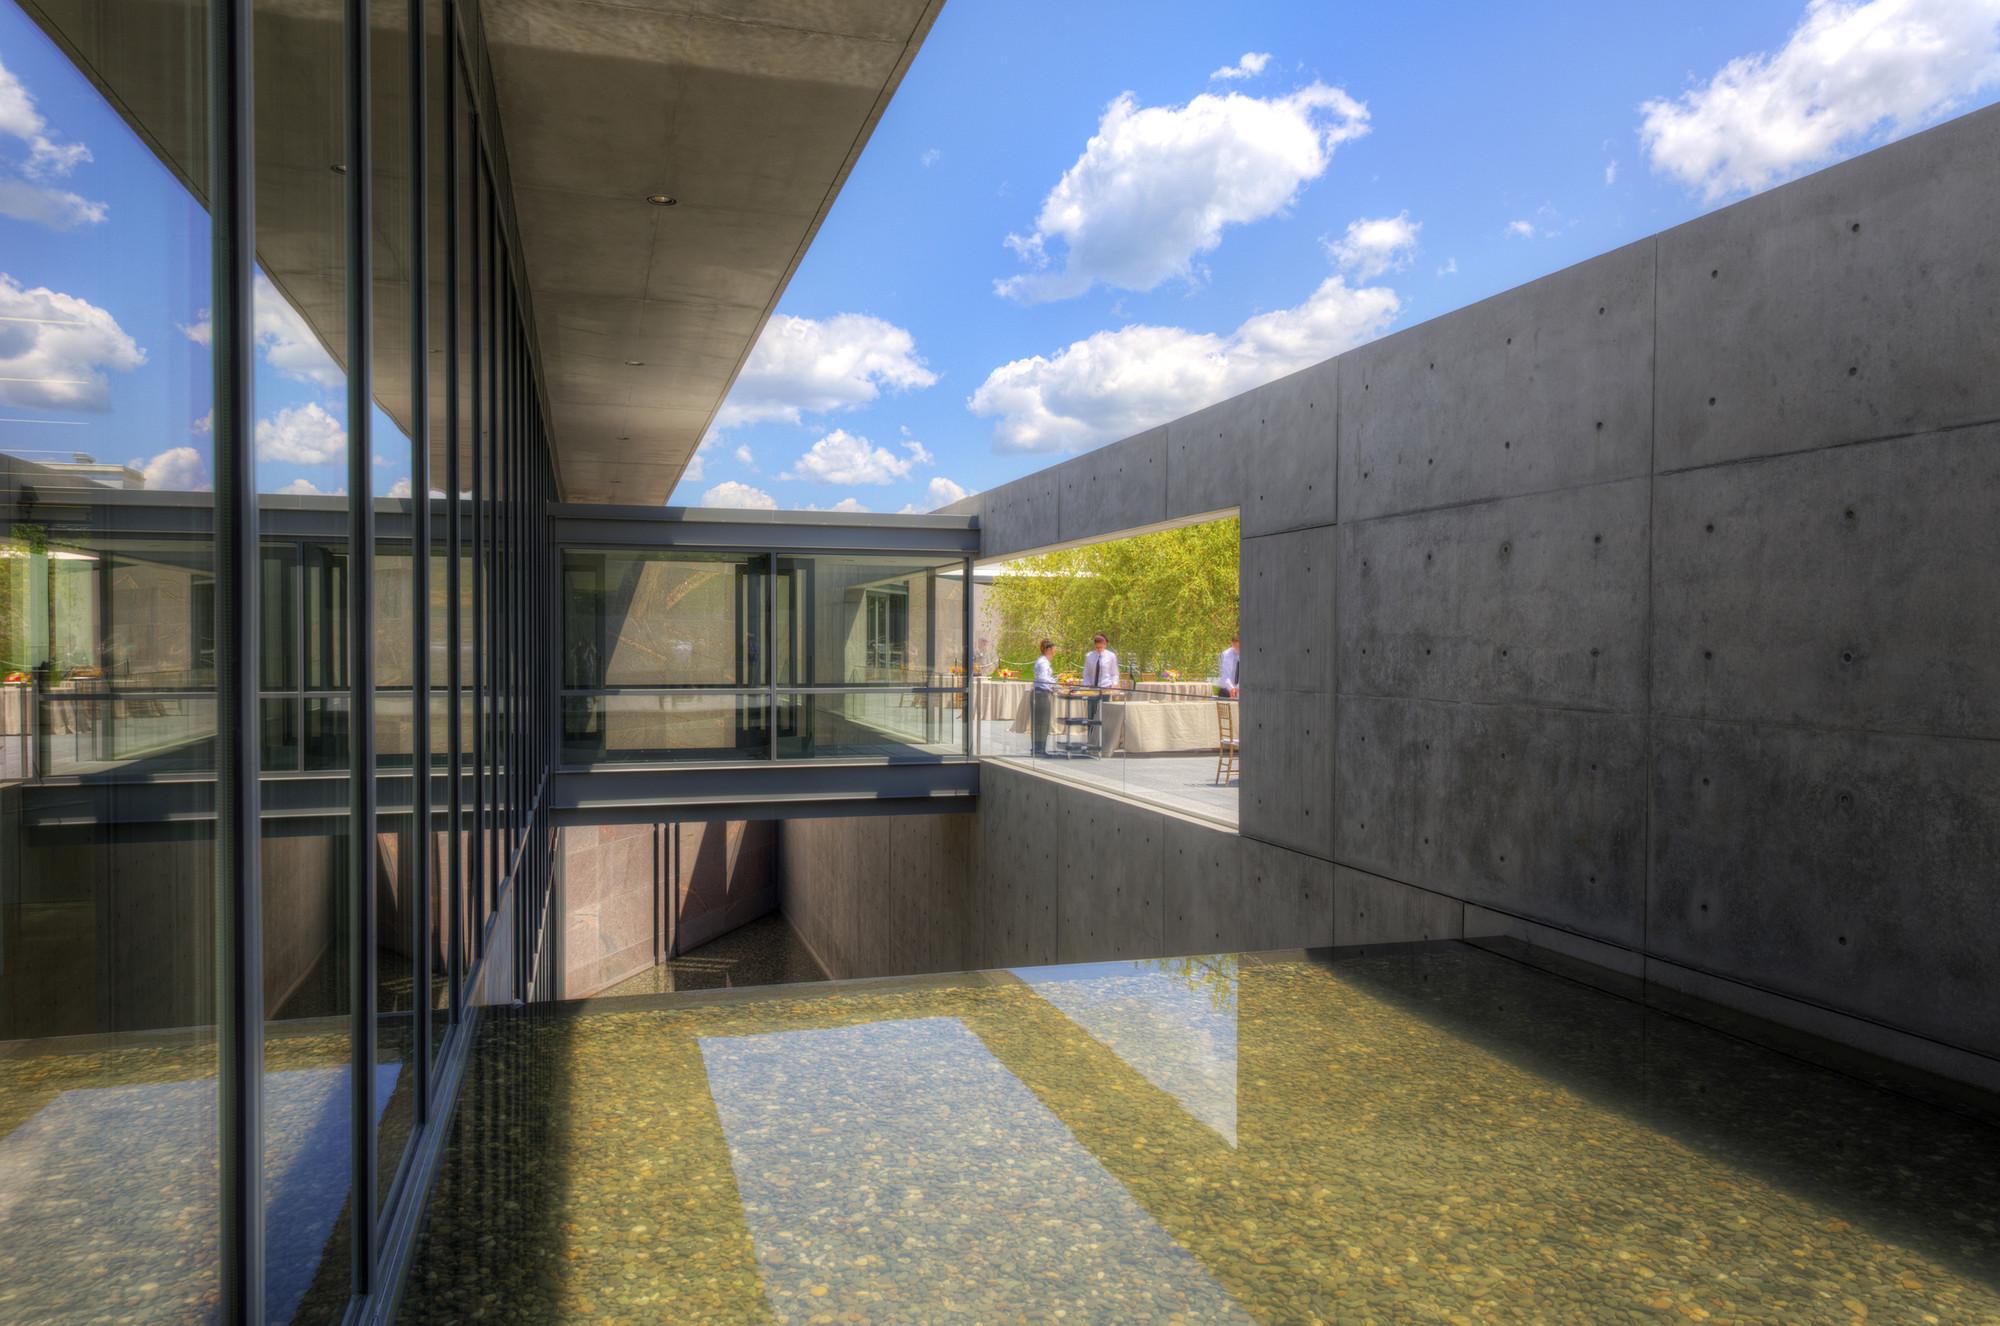 Clark art institute tadao ando architect associates for Architect associates